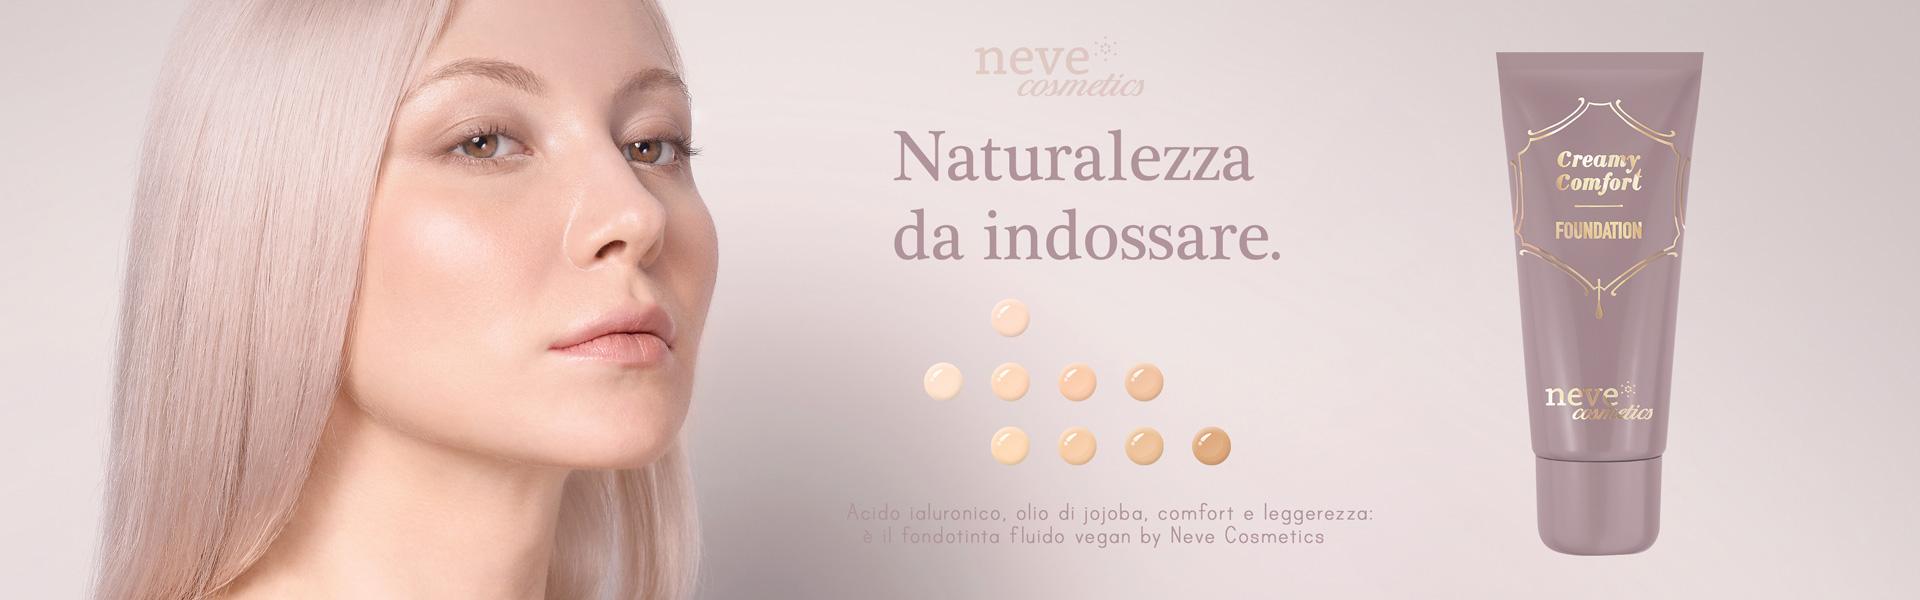 Banner-NeveCosmetics-CreamyComfort